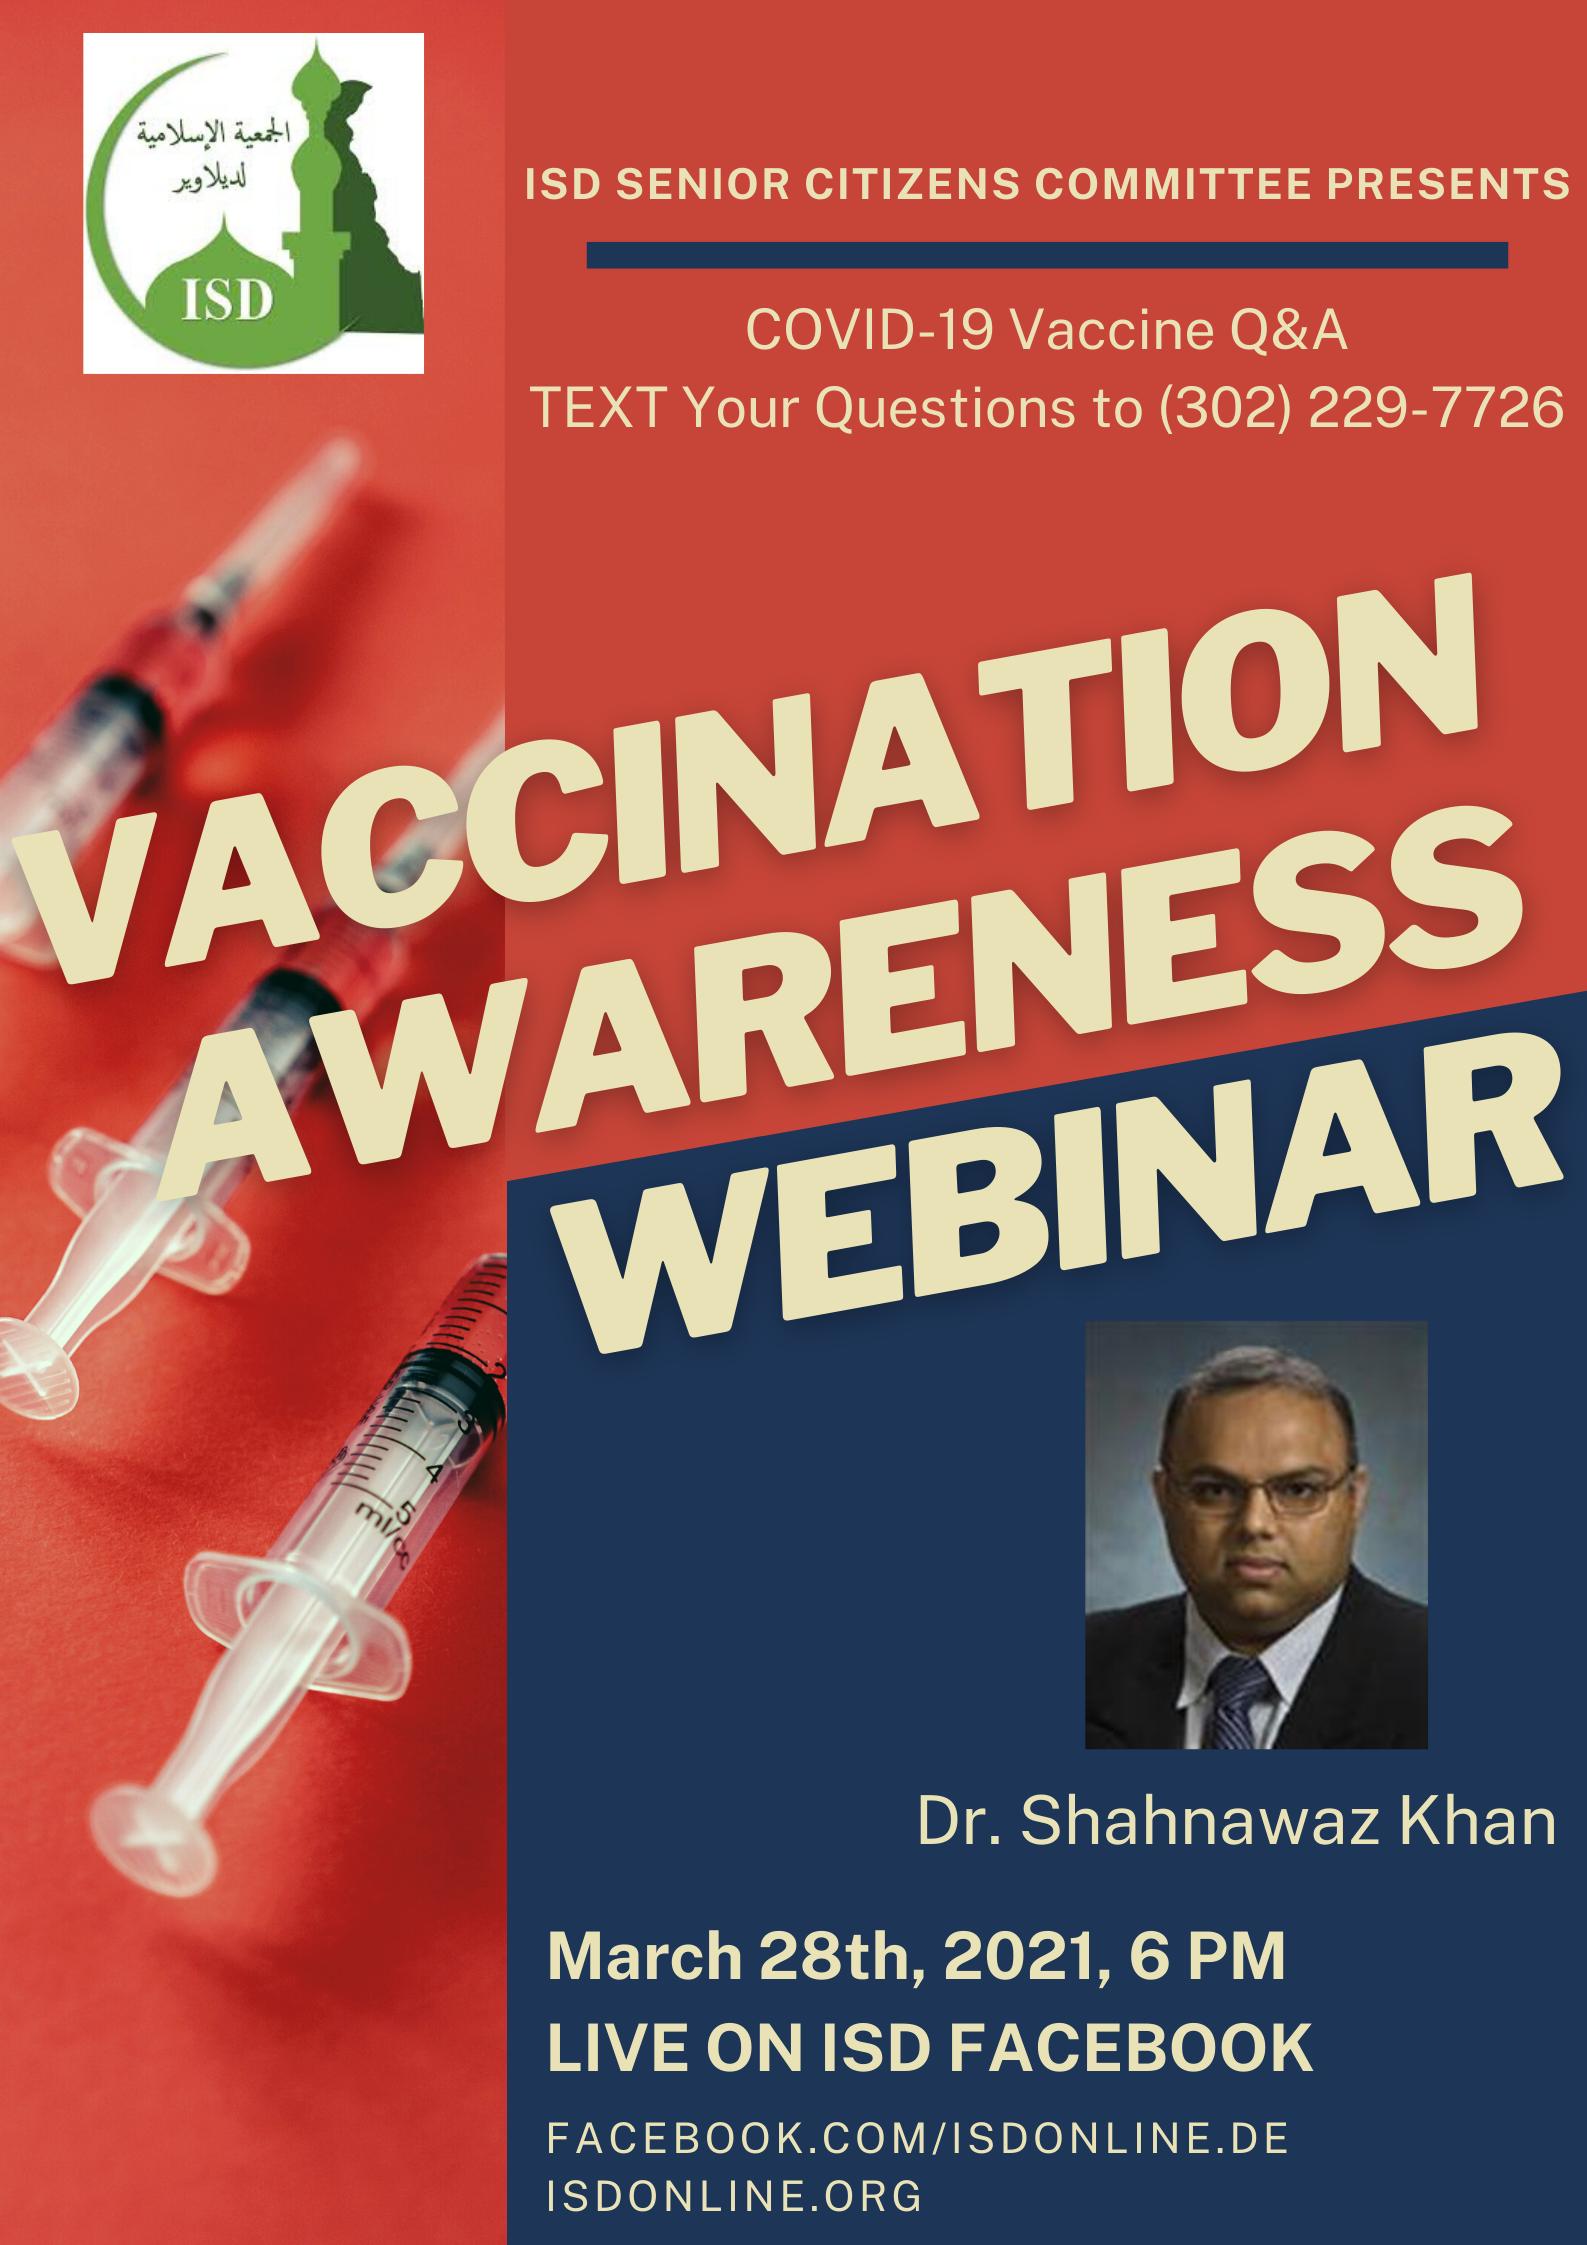 COVID-19 Vaccination Awareness Webinar